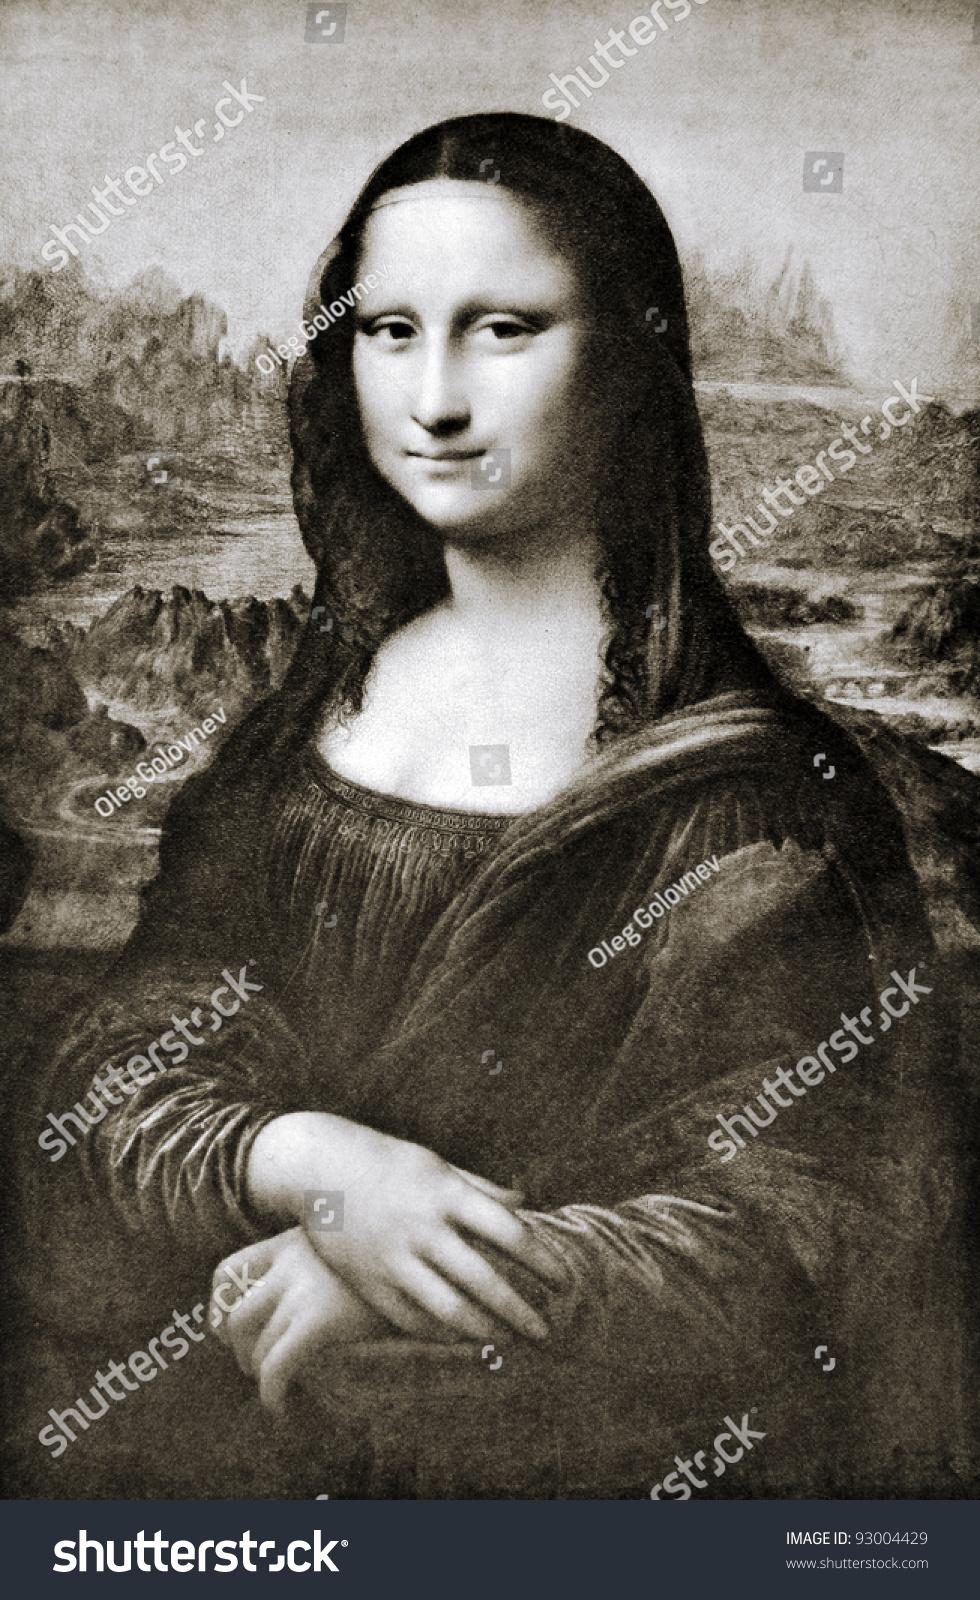 "Leonardo da Vinci (1452 - 1519) ""Mona Lisa"" La Gioconda. Reproduction from illustrated Encyclopedia ""Treasures of art"", Partnership «Prosvesheniye», St. Petersburg , Russia , 1906"